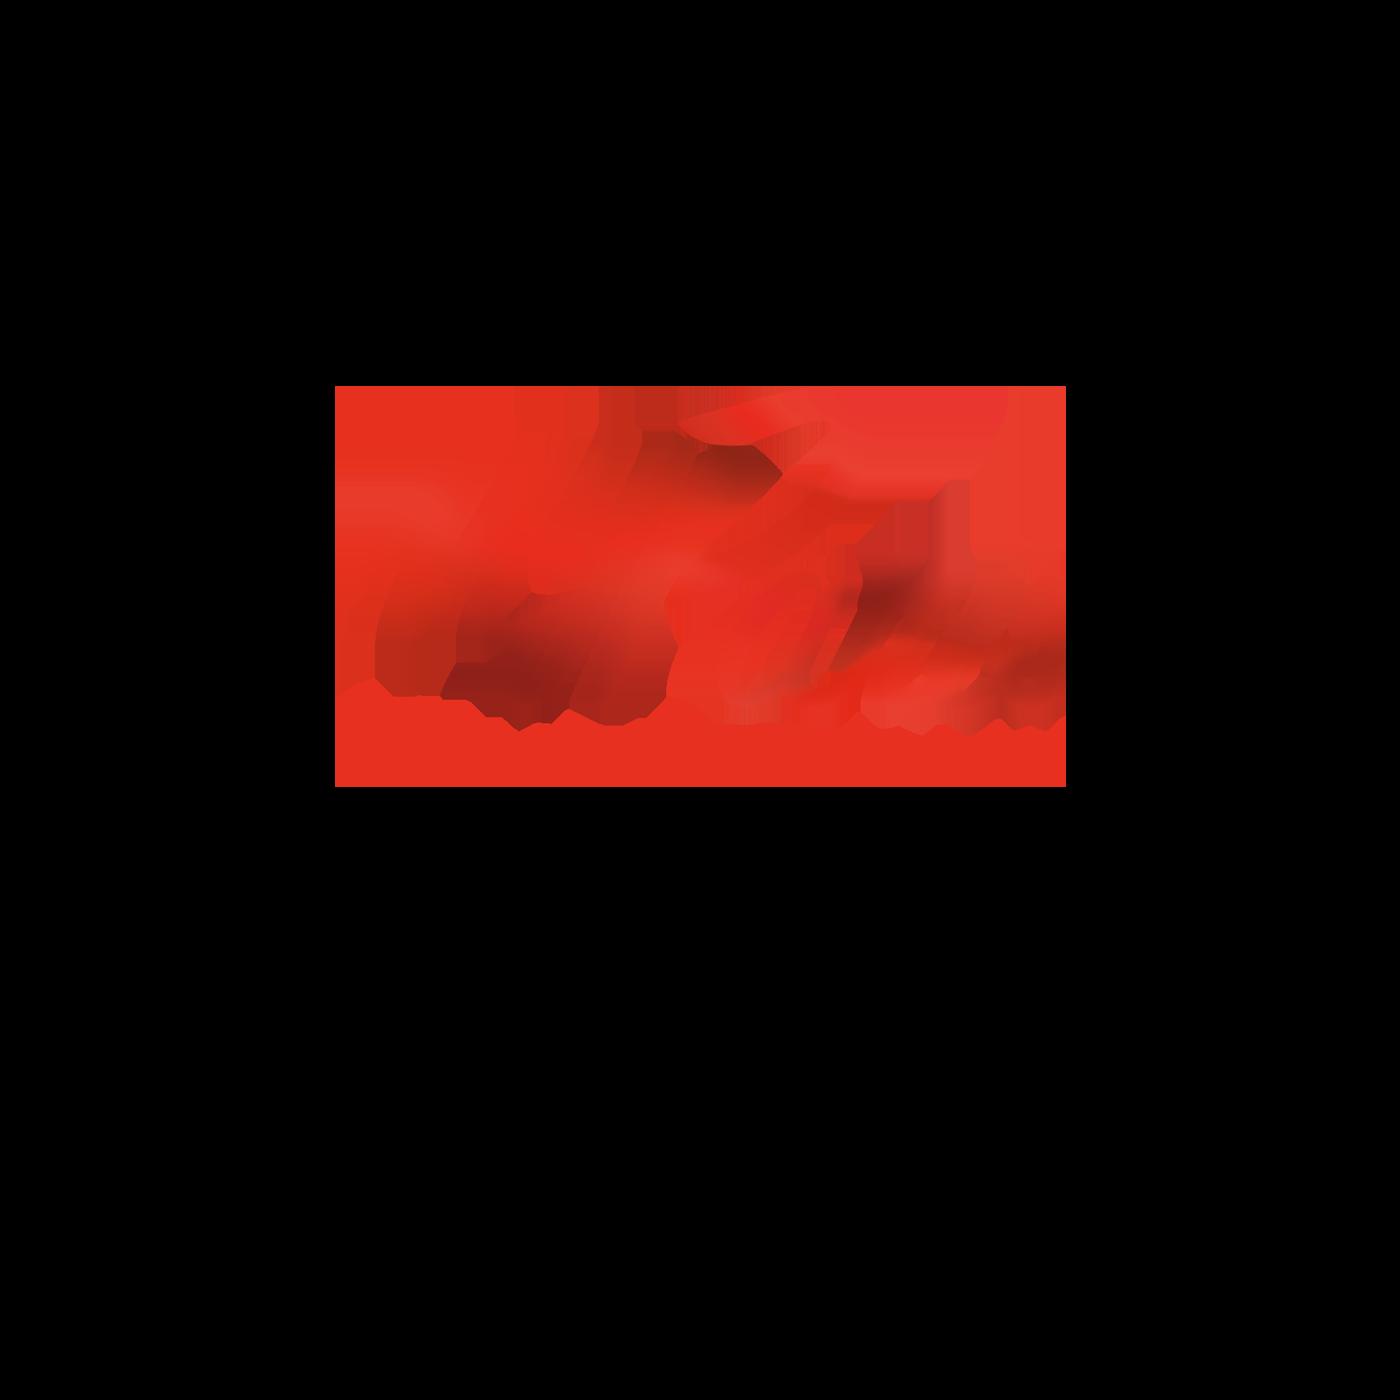 Logo Do Paris Saint Germain Png - Get Images One